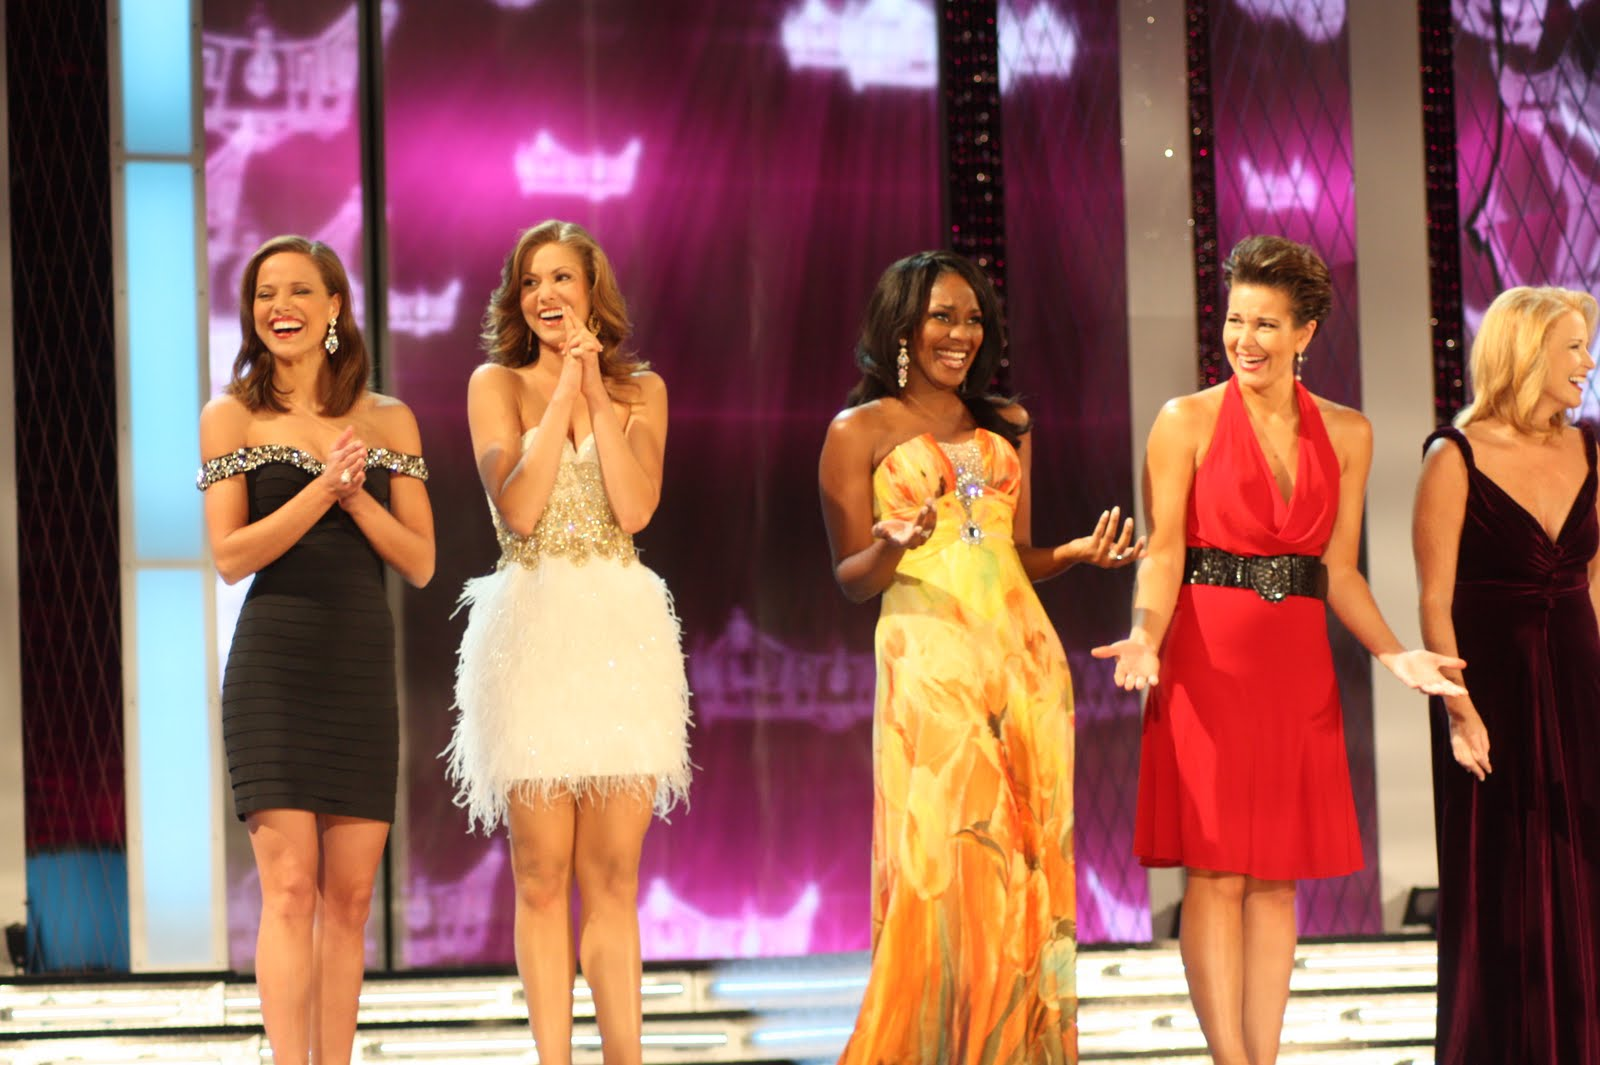 Miss Minnesota 2010 Travels: My Miss America Journey - Day 7